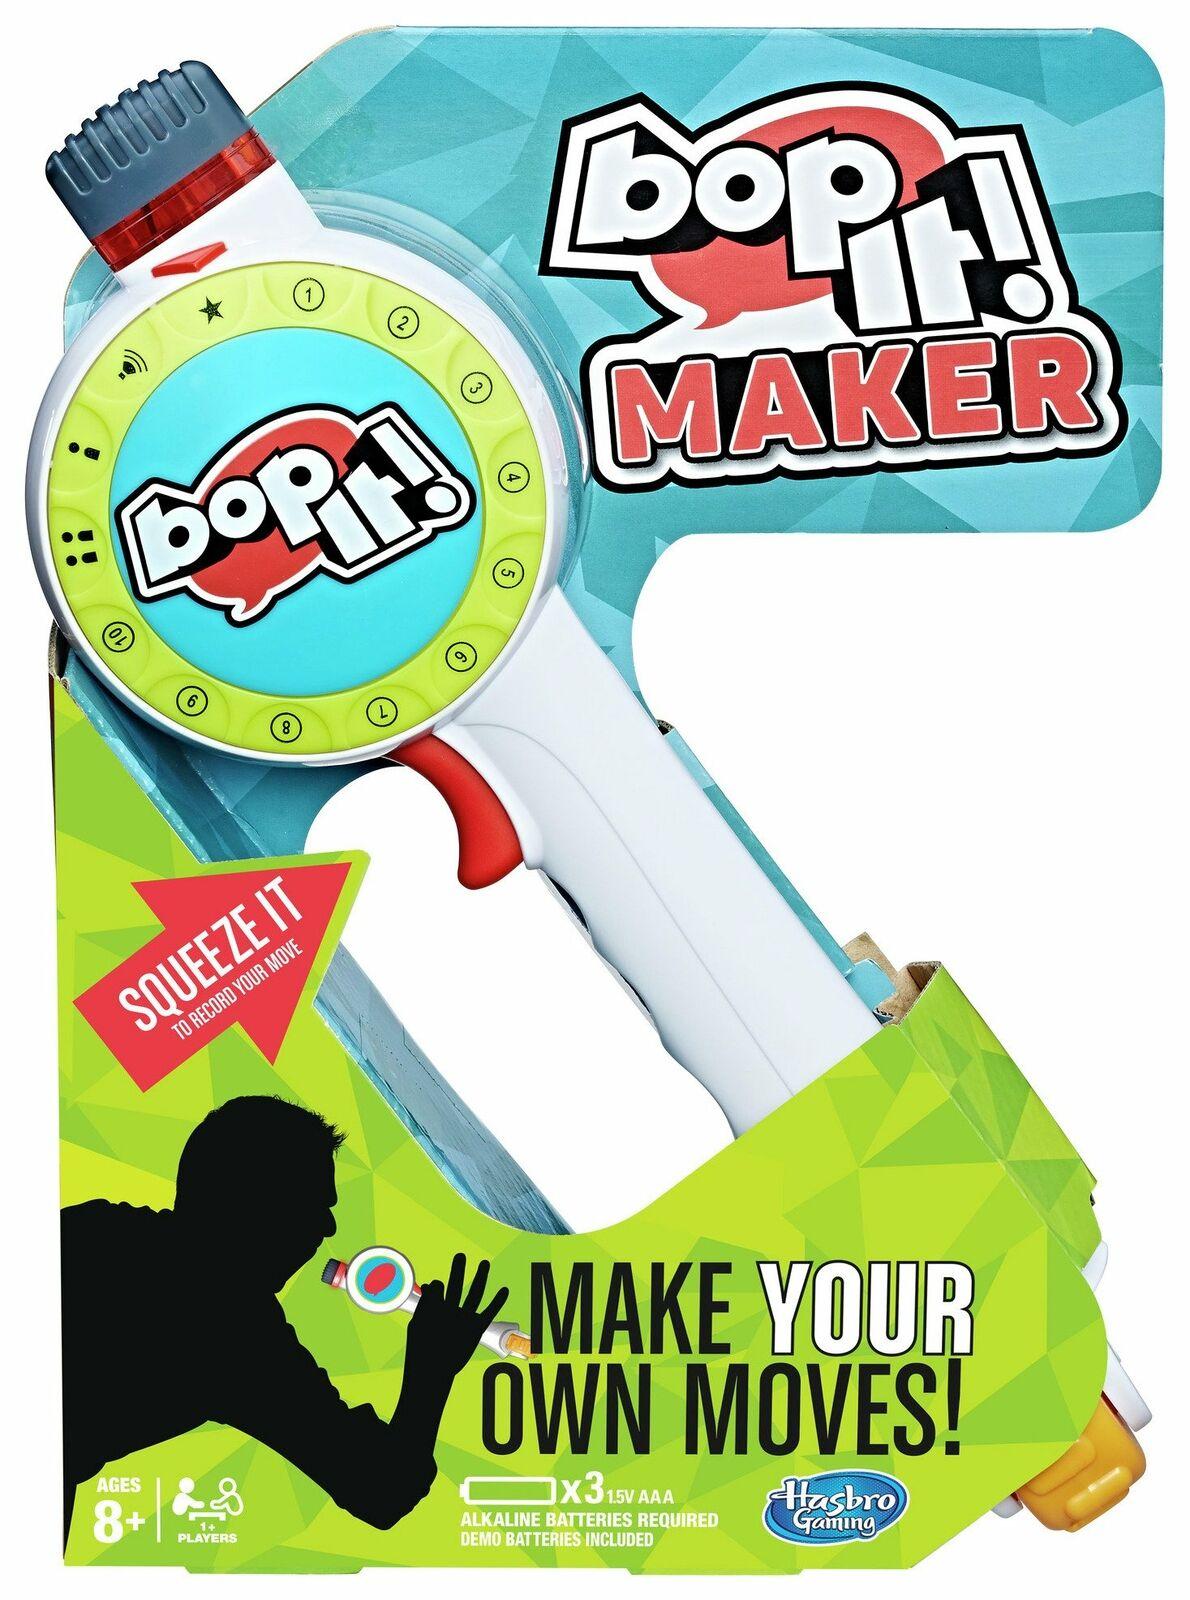 Bop It! Maker Game from Hasbro Gaming 8+ Years £6.99 @ Argos / Ebay